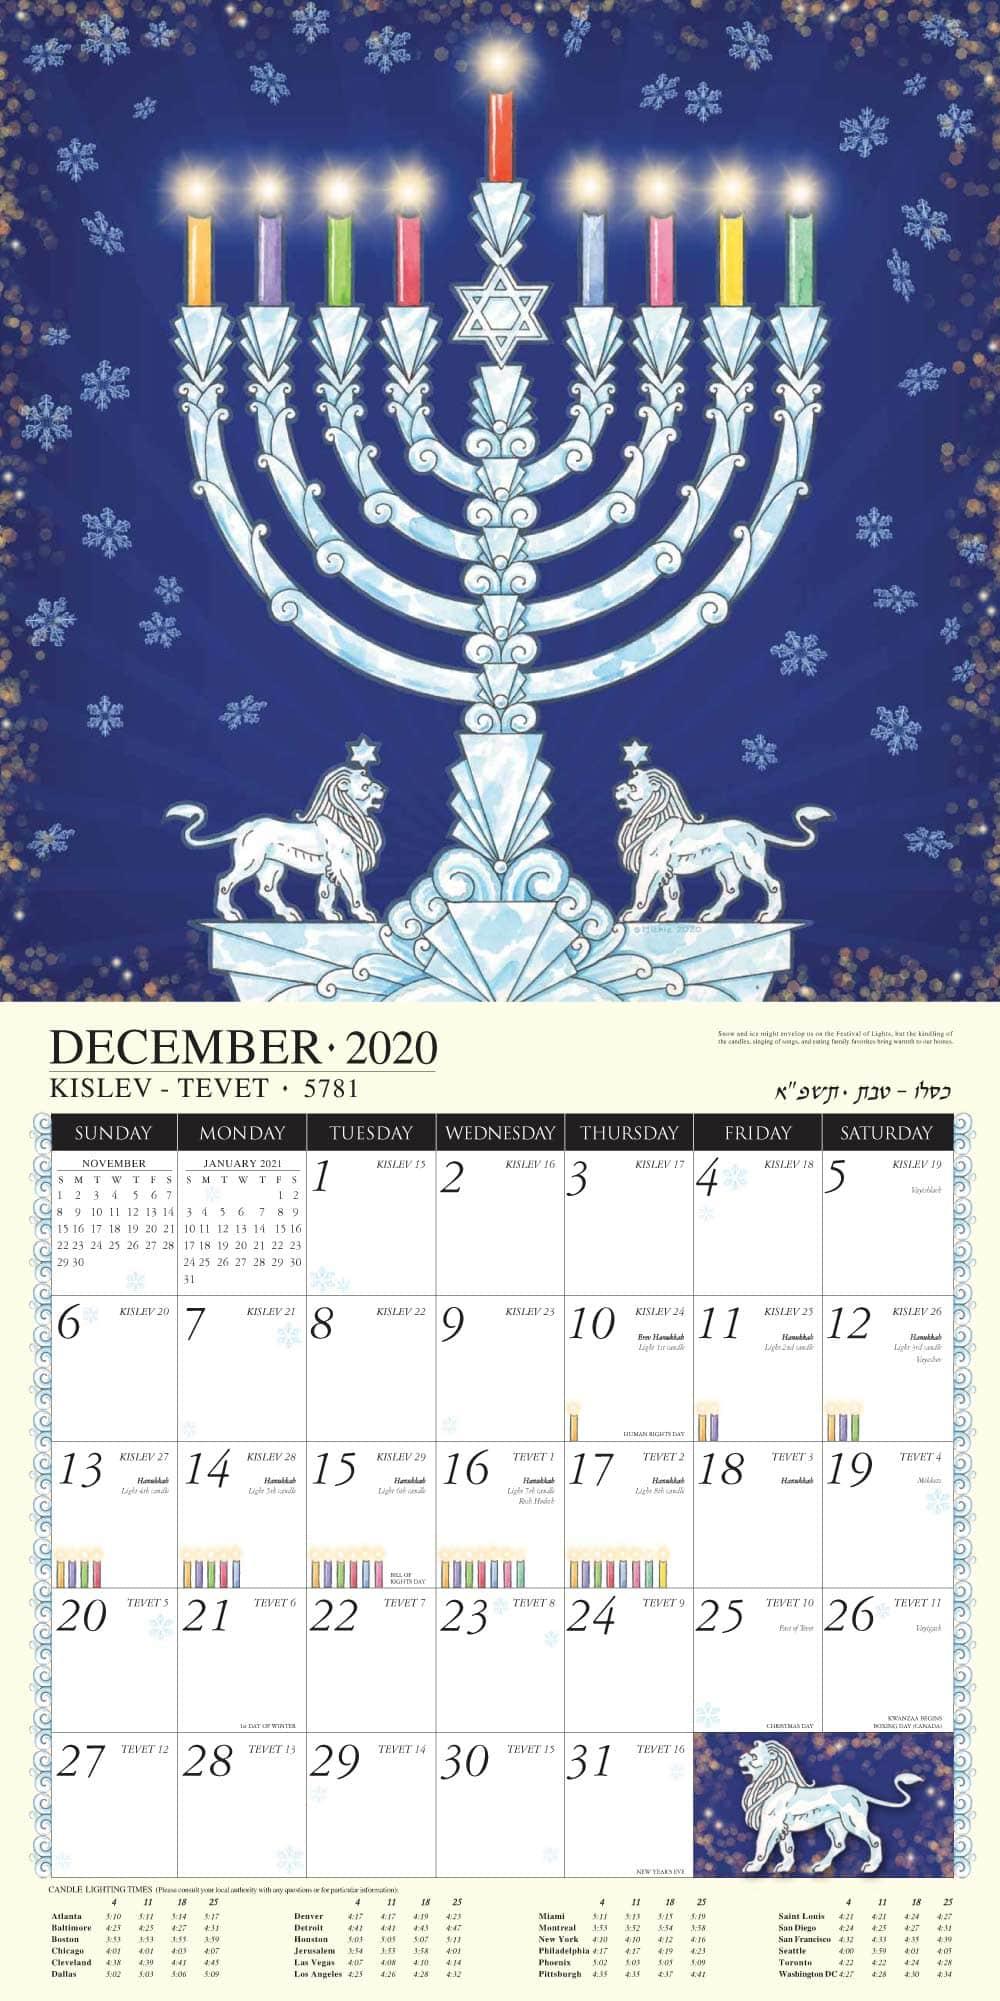 Jewish Art Calendar 2021 by Mickie - Caspi Cards & Art